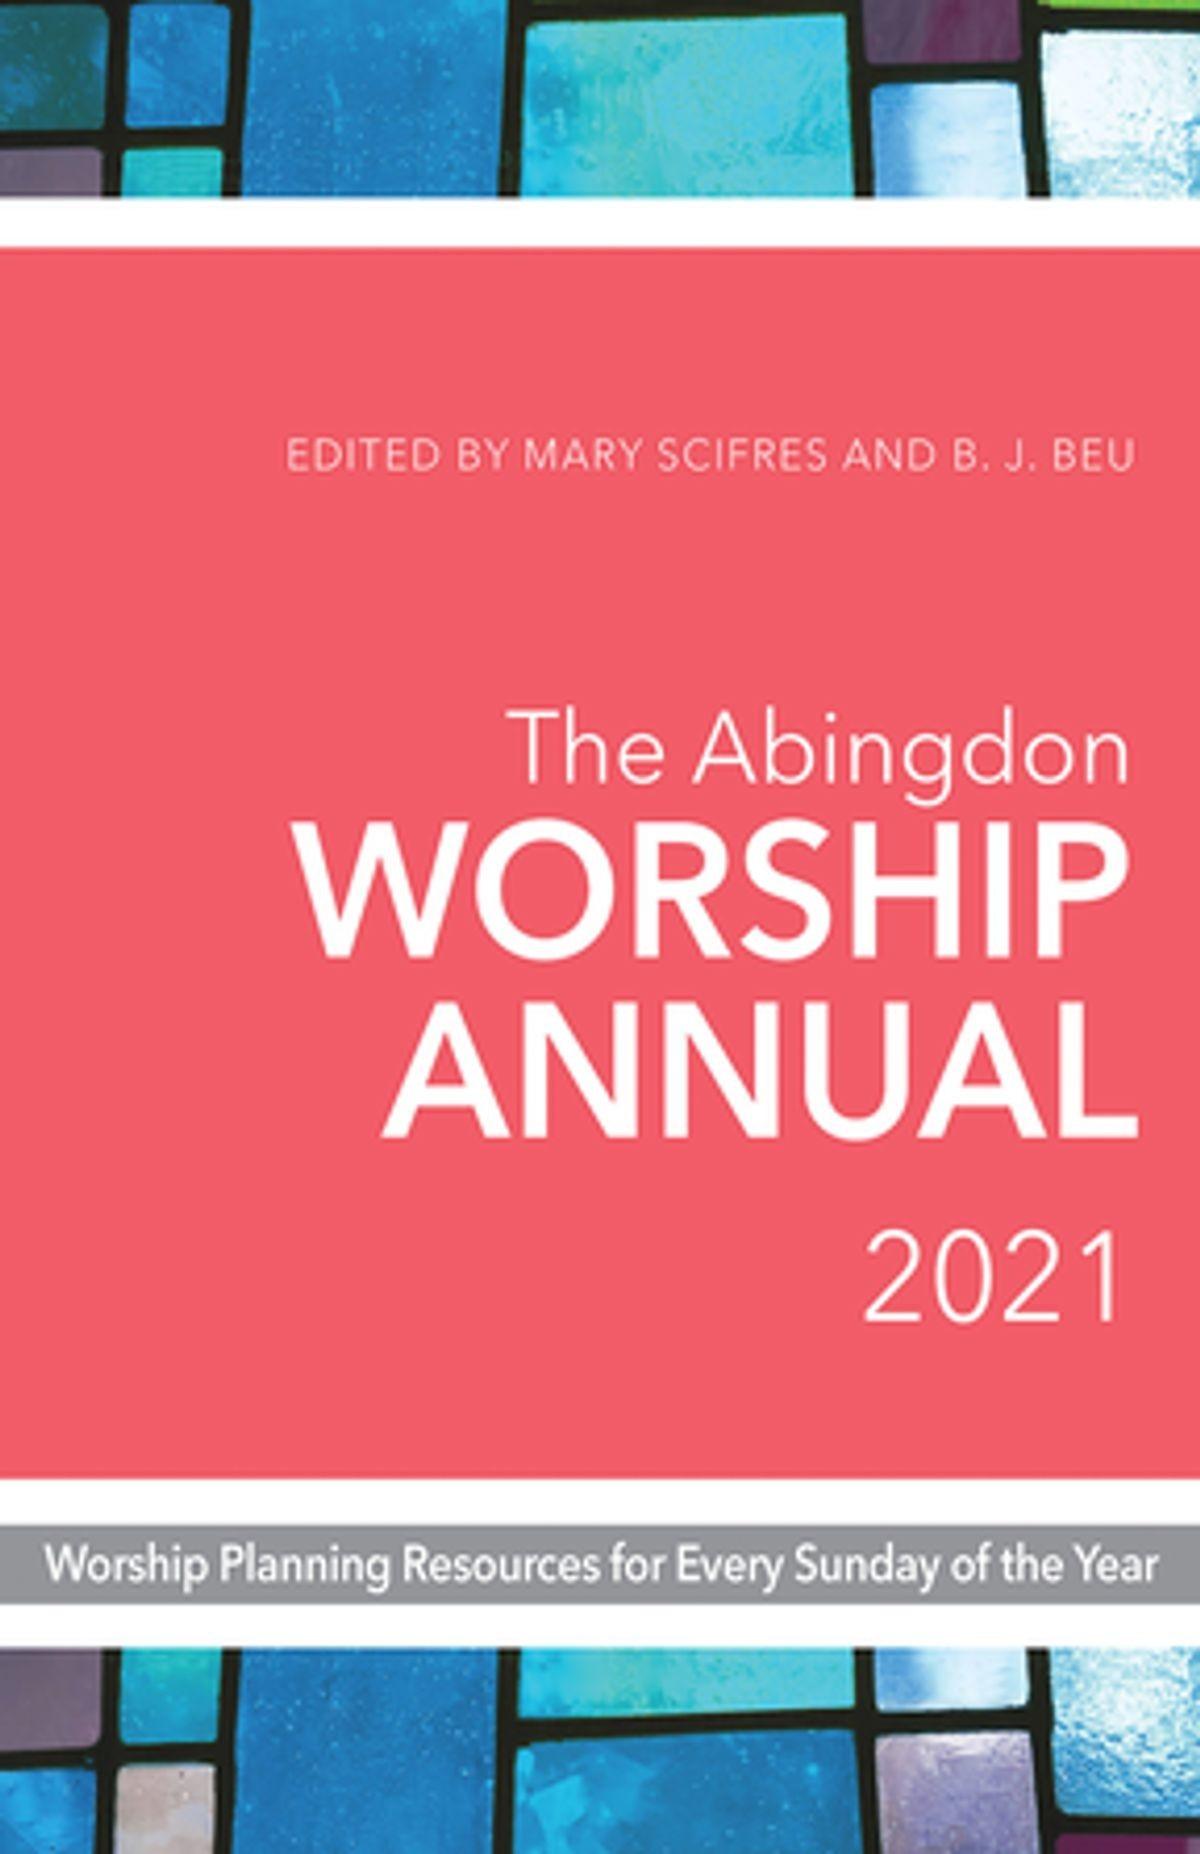 The Abingdon Worship Annual 2021 Ebookmary Scifres - Rakuten Kobo  Revised Common Lectionary 2021 Methodist